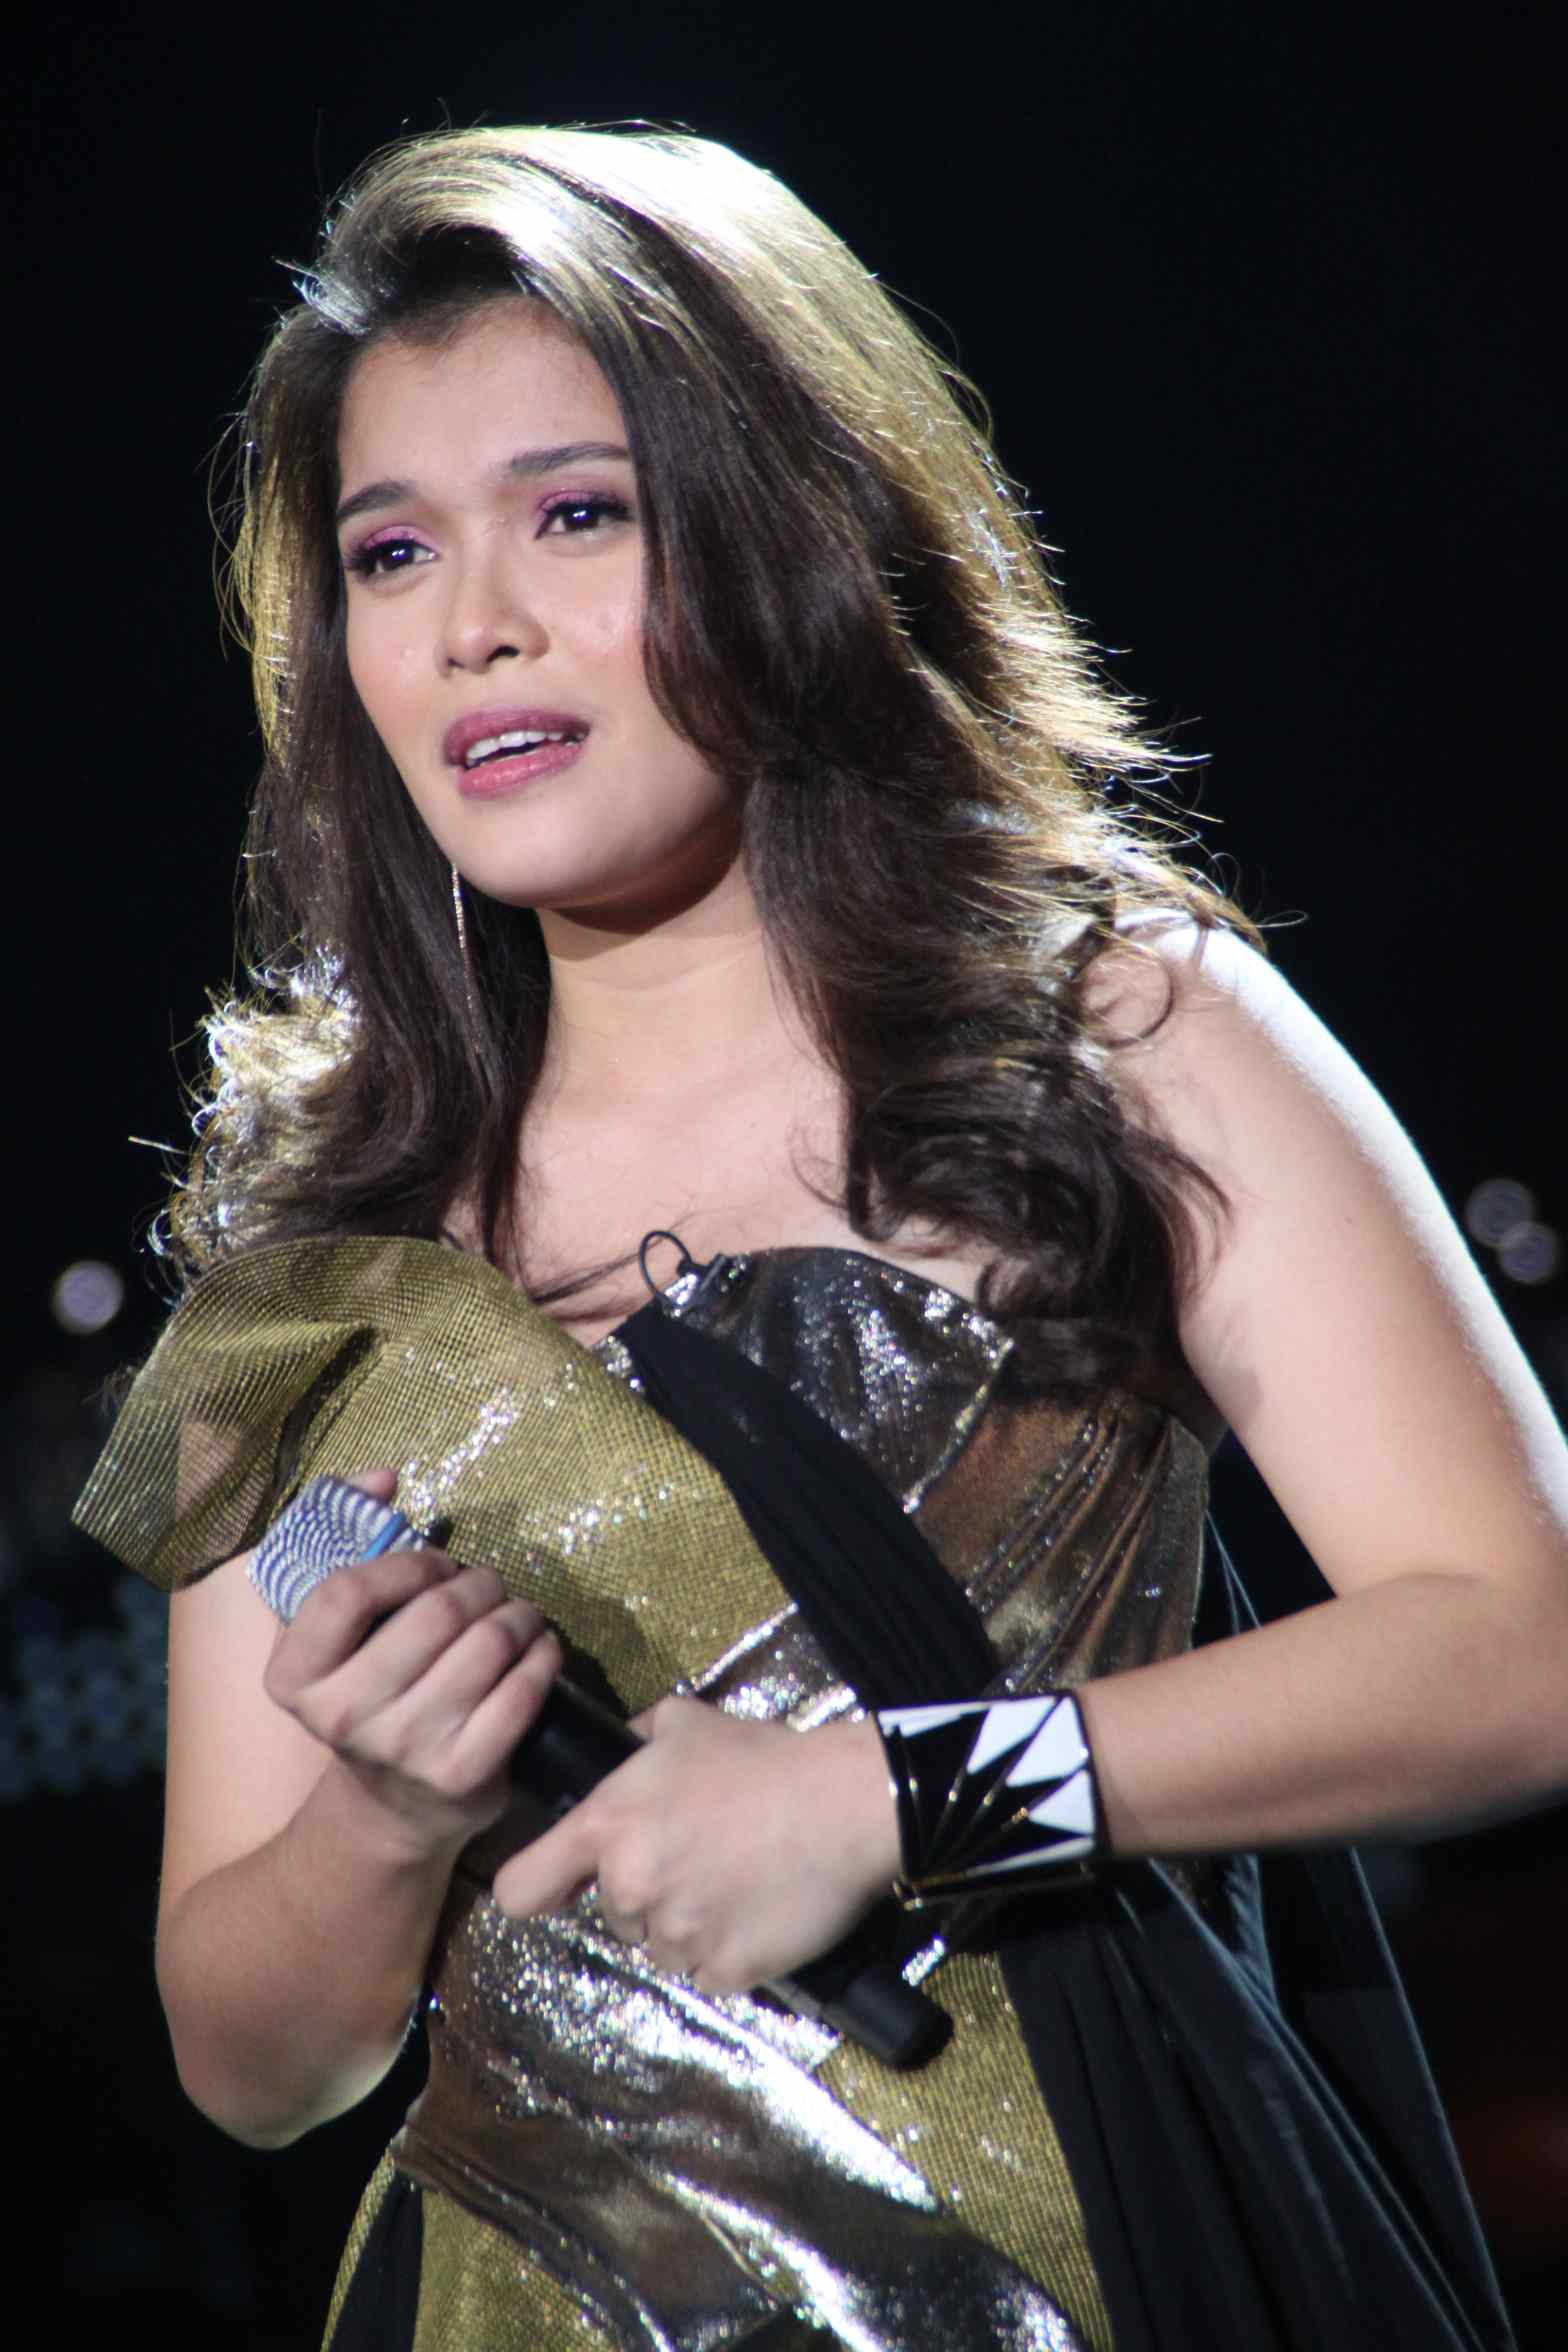 KZ Tandingan Is The 1st Winner Of The X Factor